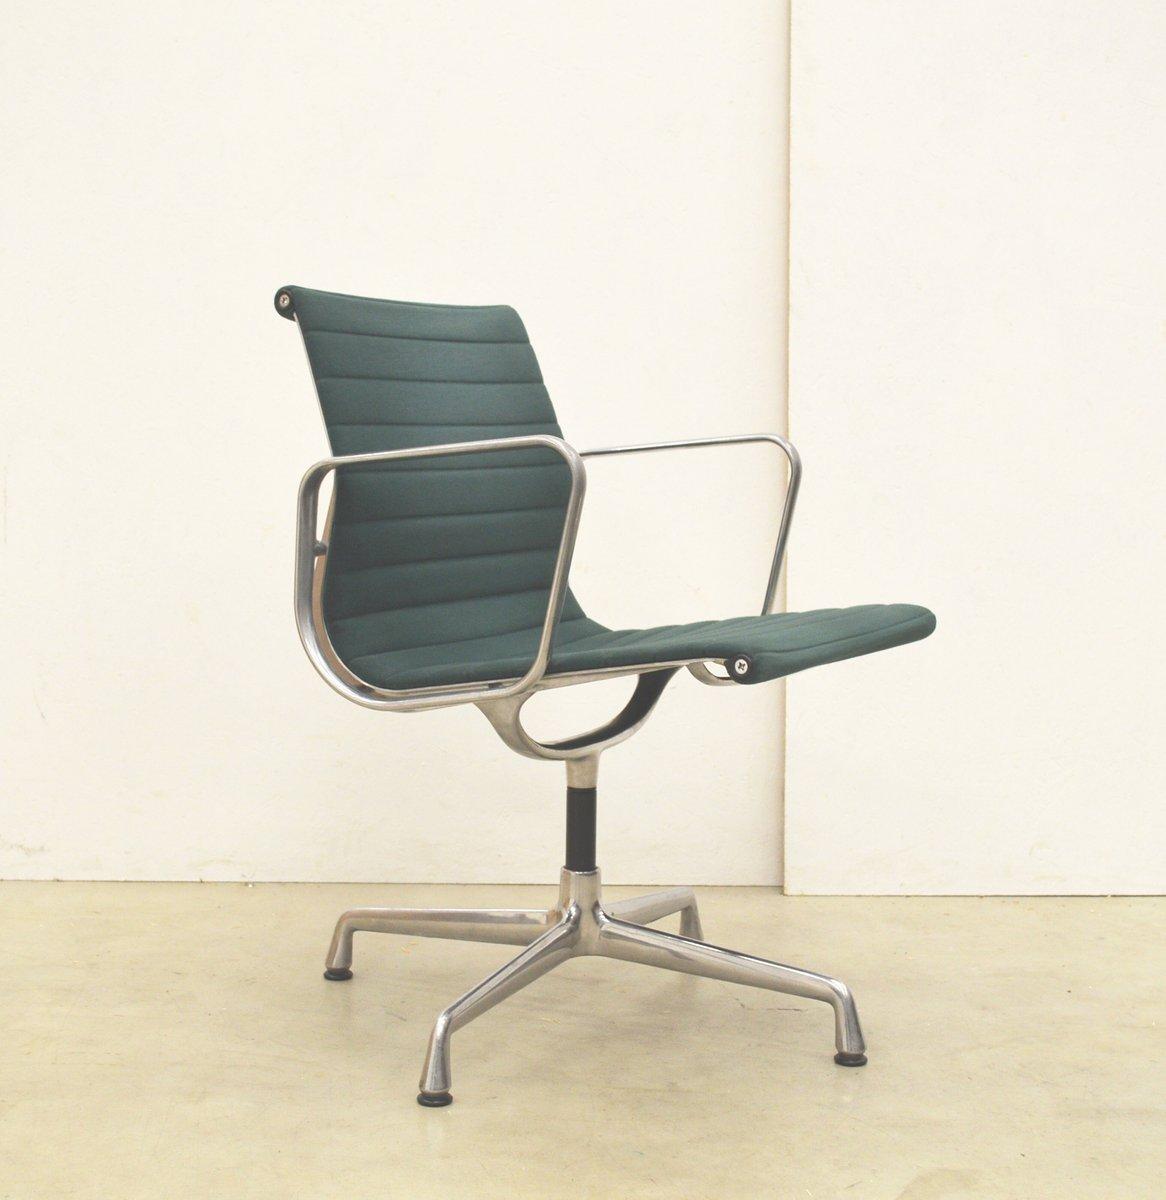 Bürostuhl designklassiker eames  Grüner EA108 Aluminium Bürostuhl von Charles & Ray Eames für Vitra, 1980er,  5er Set